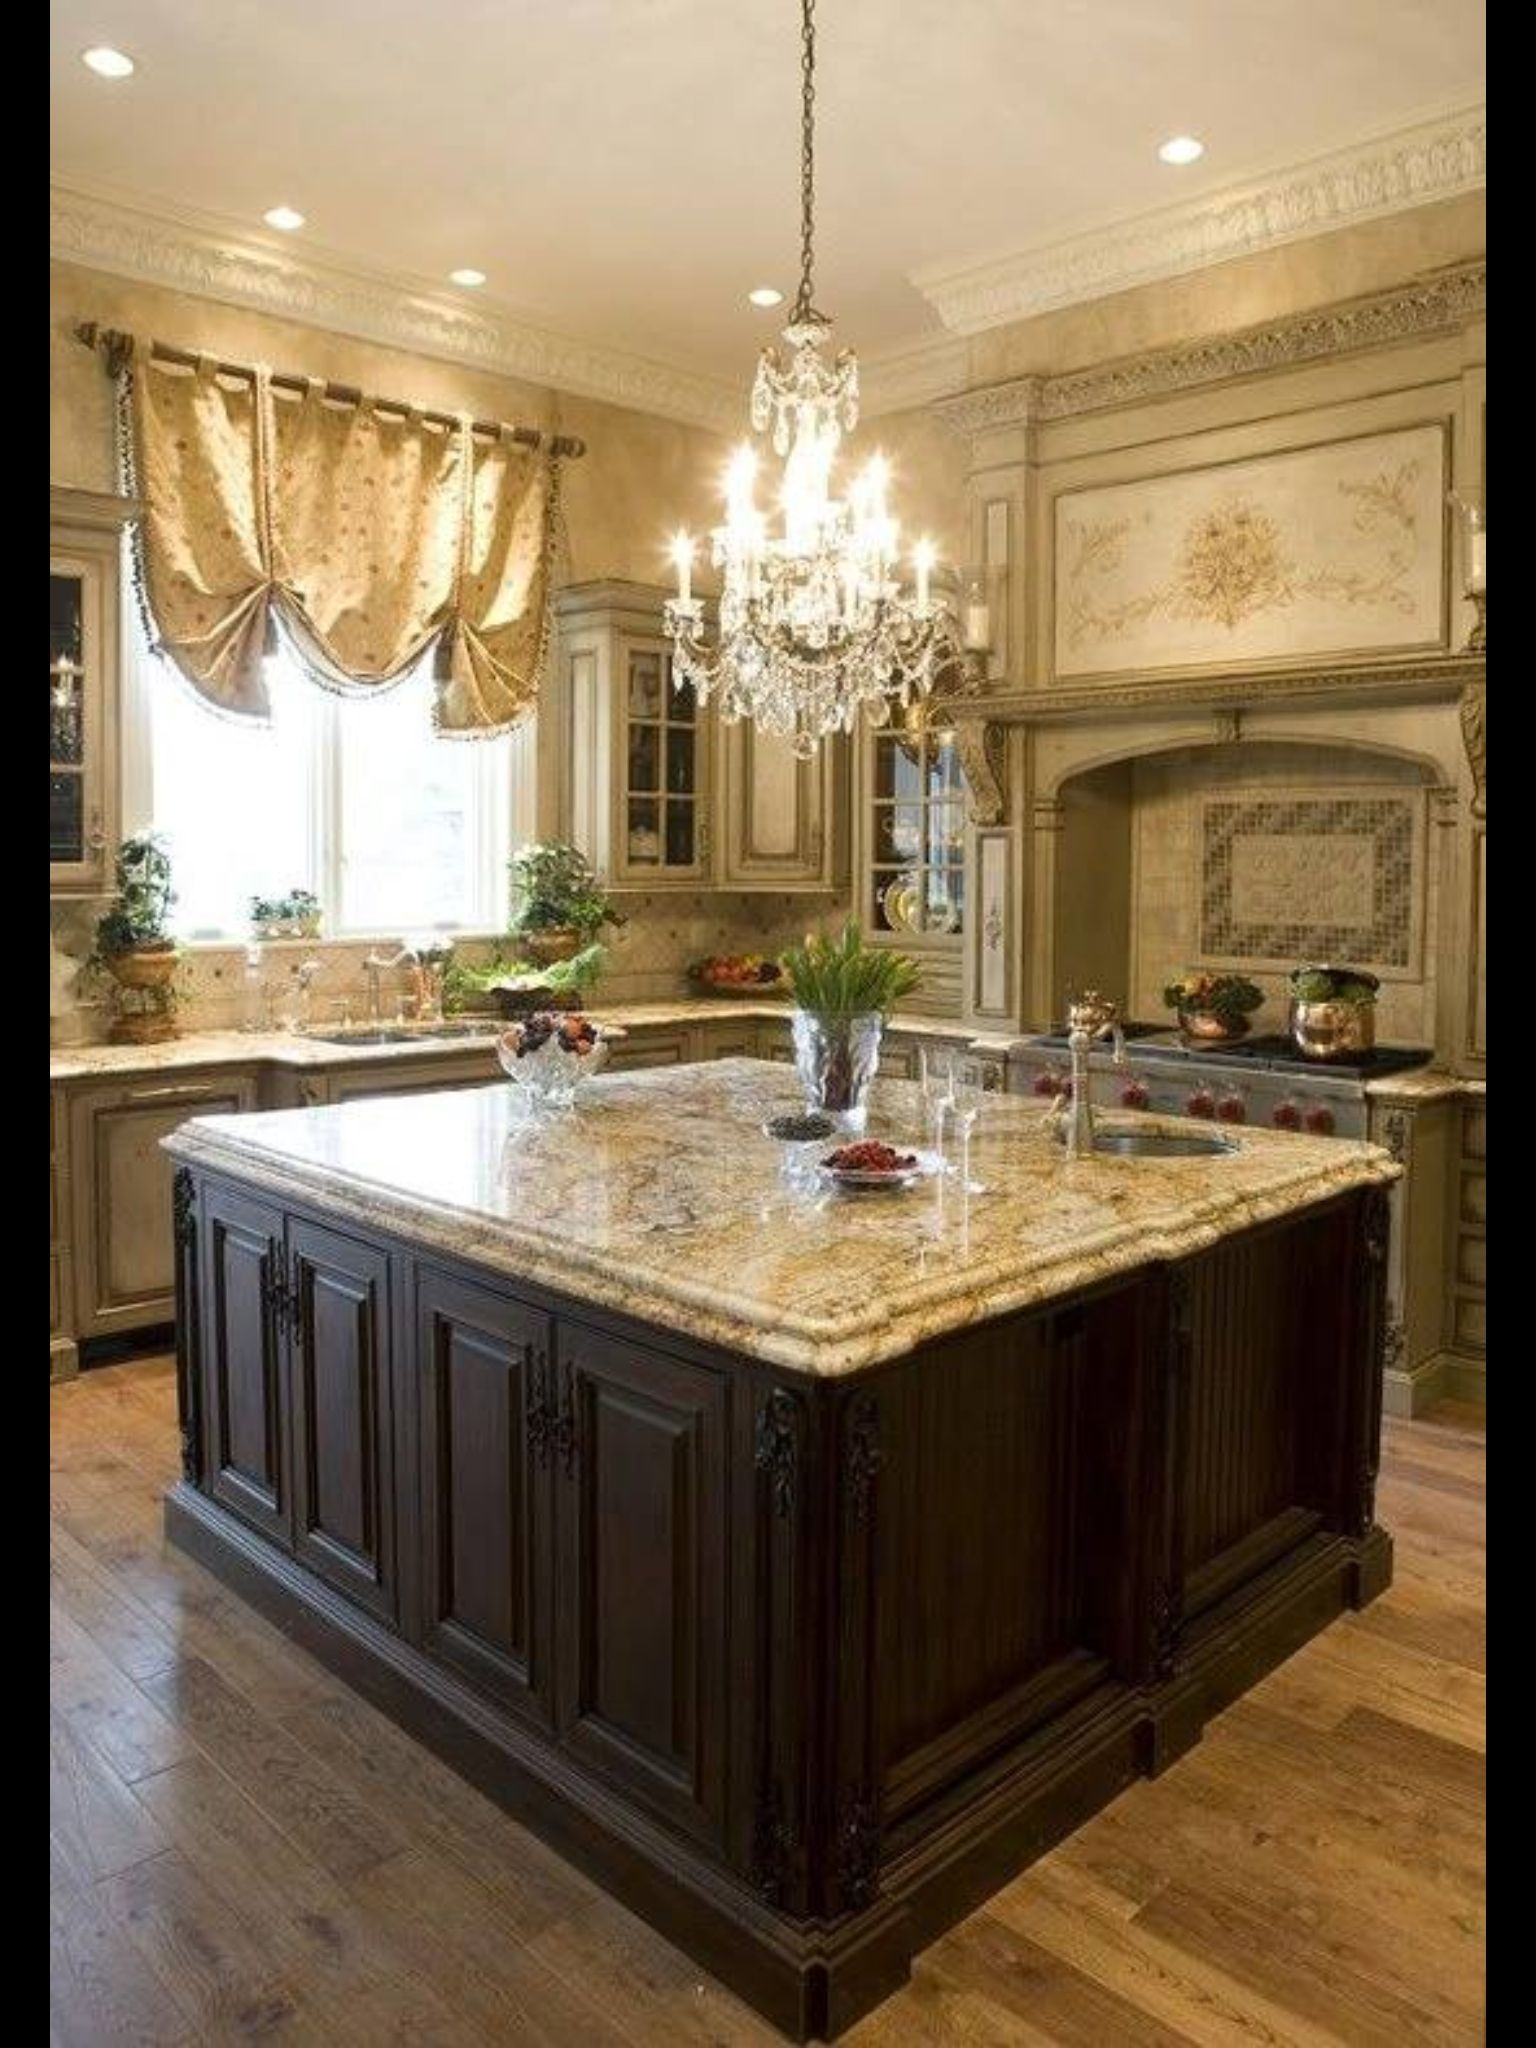 kitchen chandeliers corner cabinet storage tuscan style ideas on foter 5